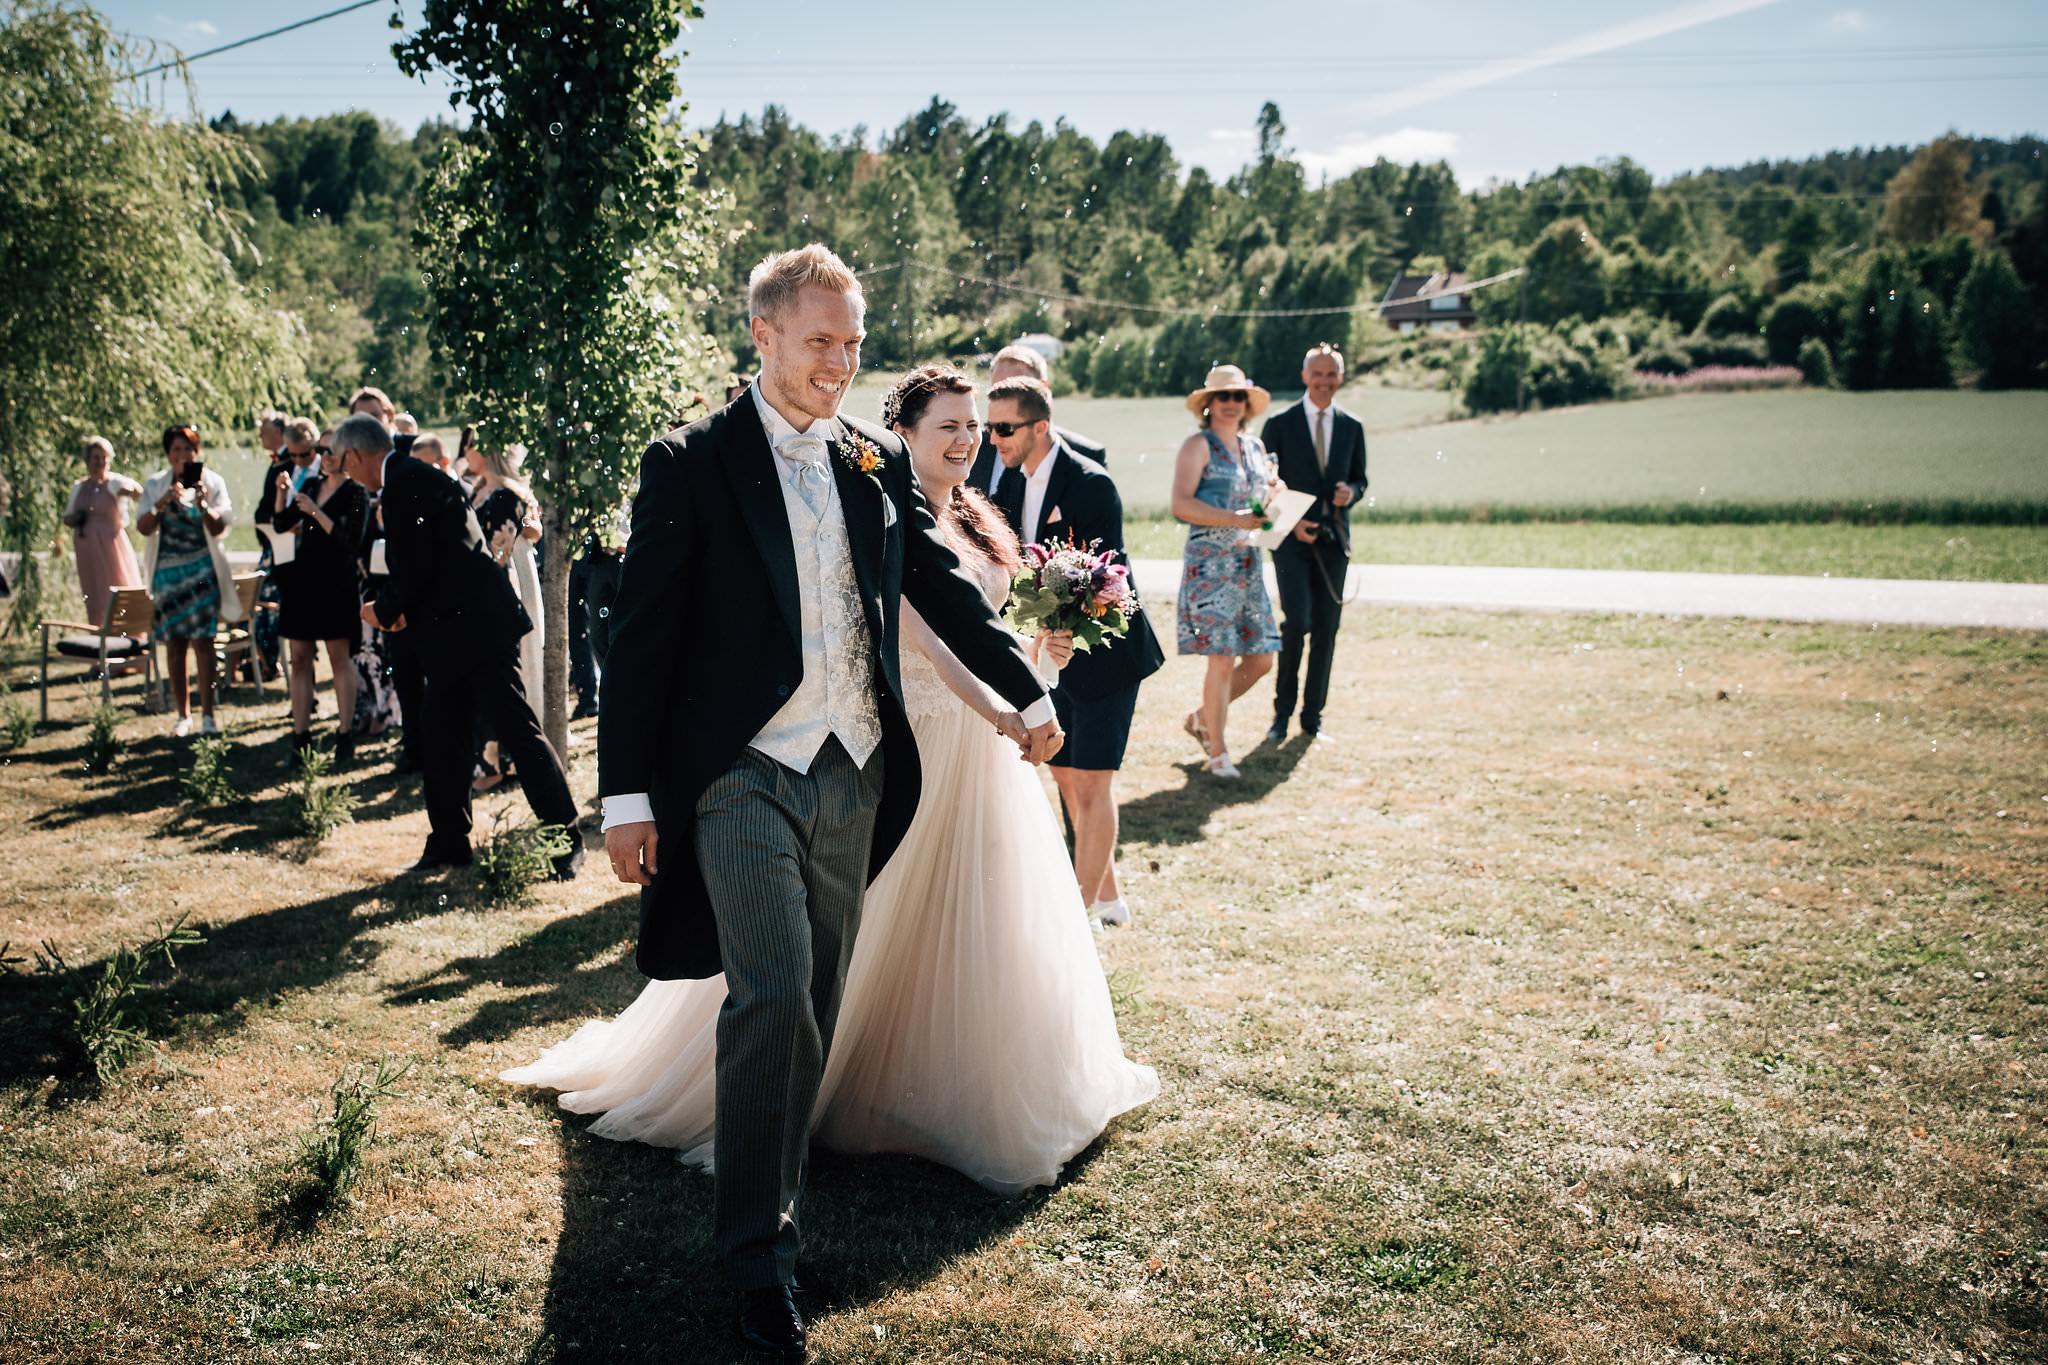 750_3656-fotograf-vestfold-bryllupsfotograf-.jpg